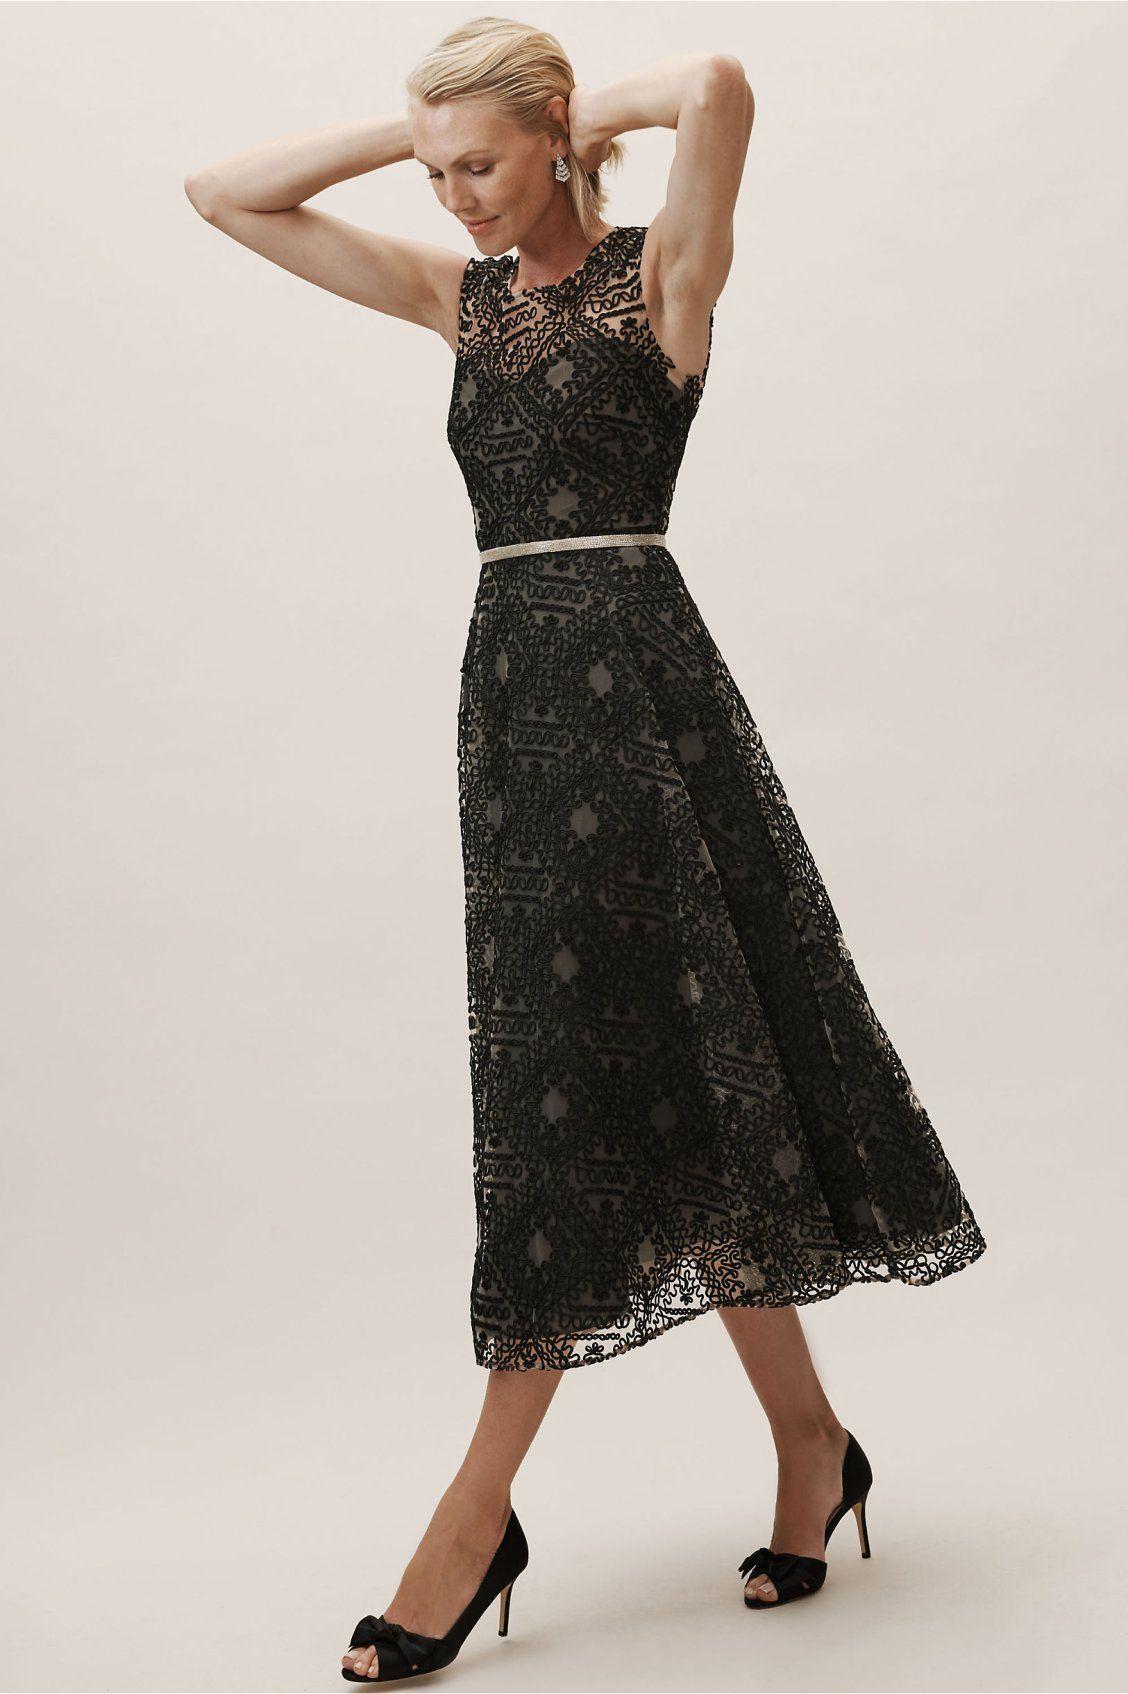 Presley Dress from BHLDN Dresses, Womens dresses